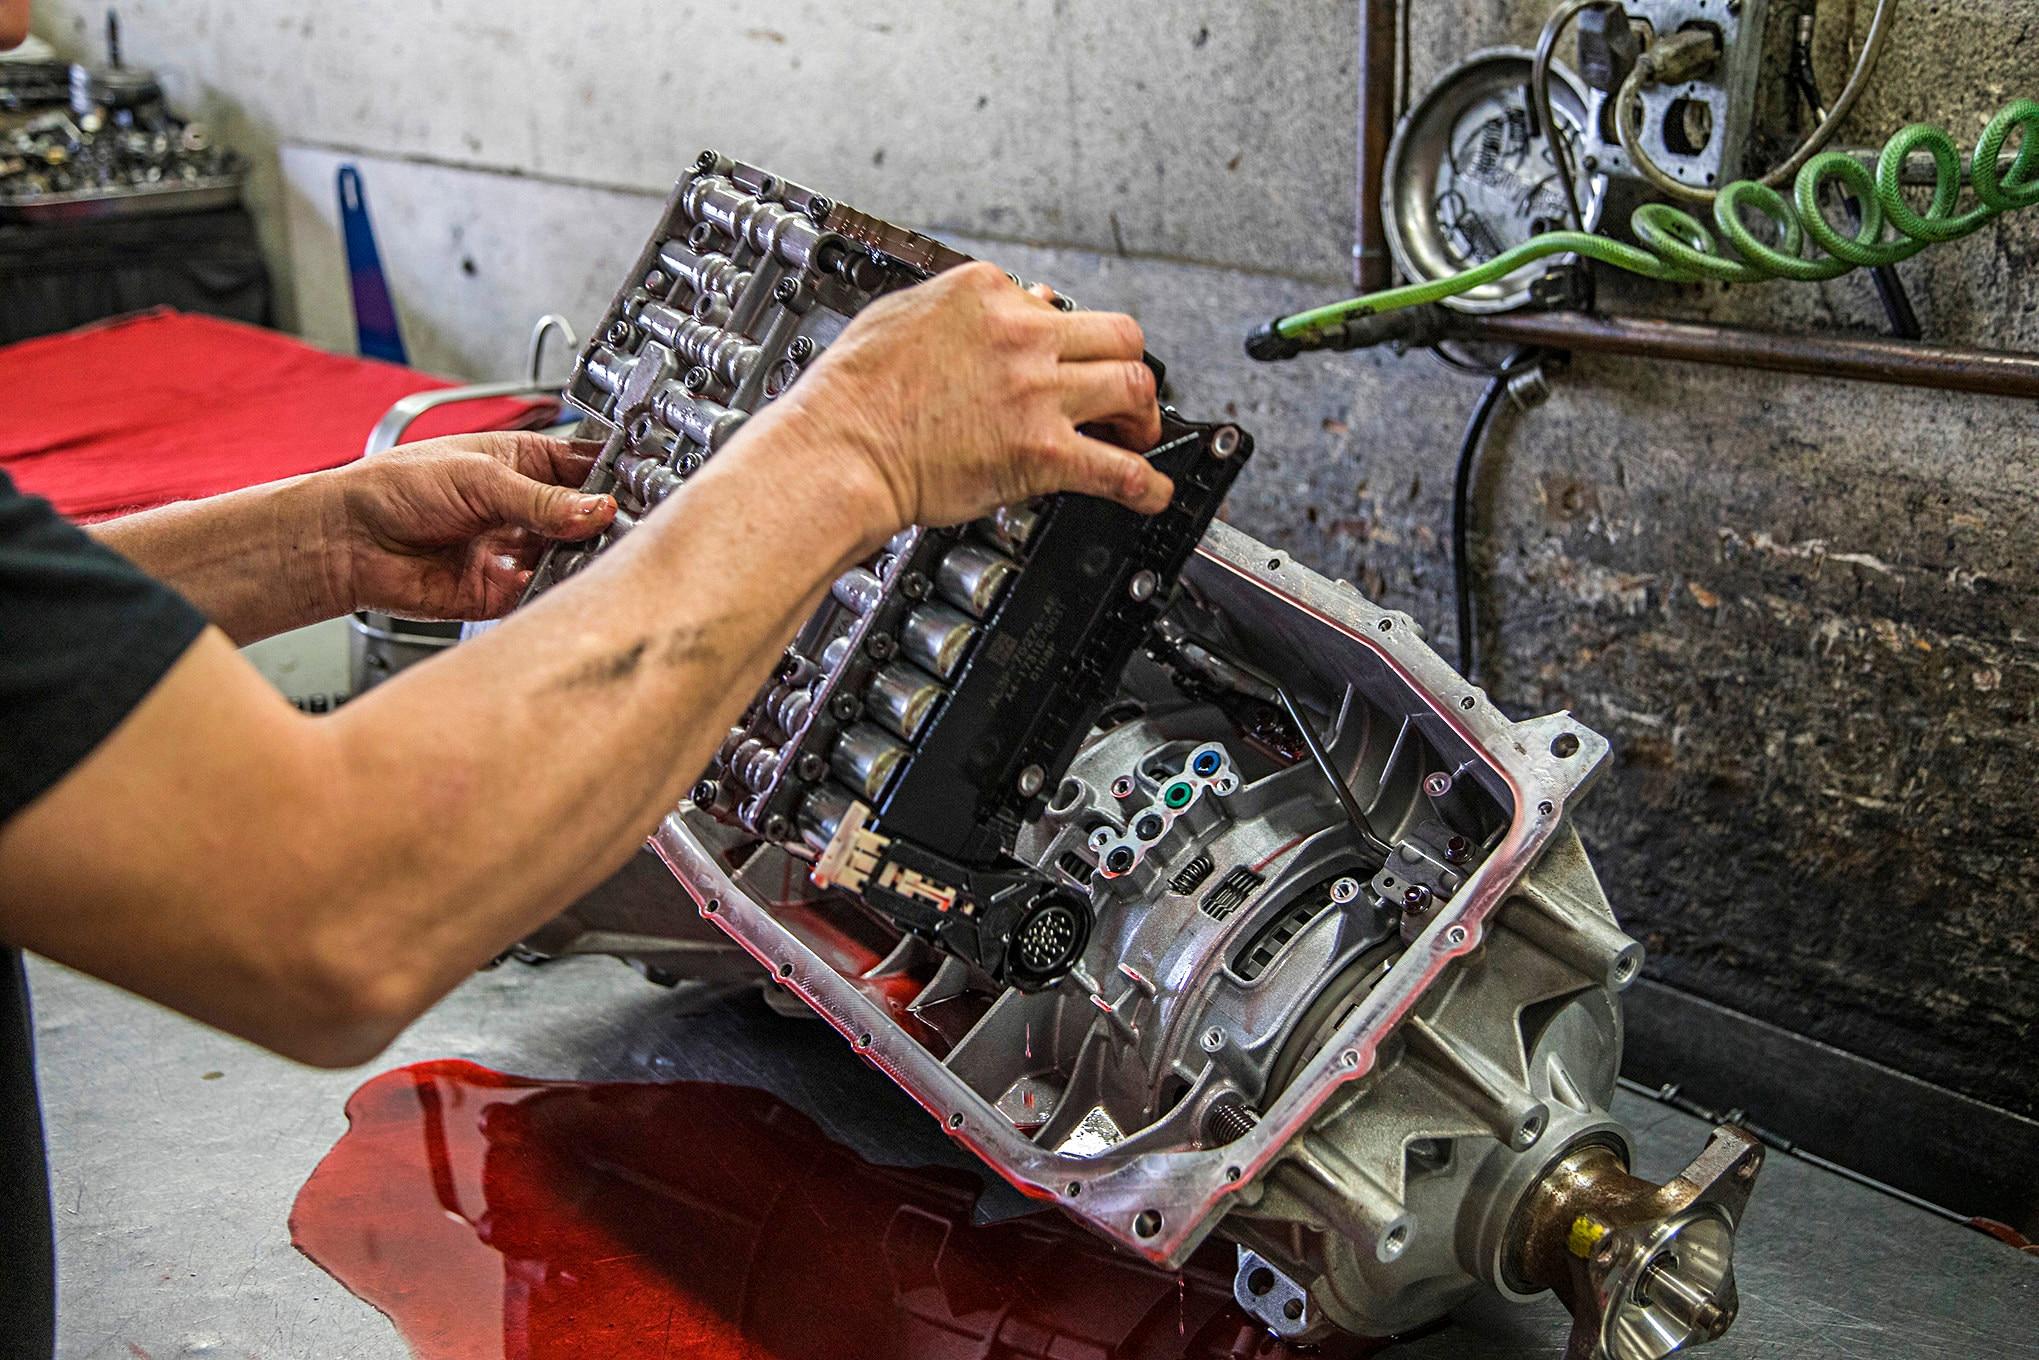 003 Mustang 6r80 Transmission Valve Body - Photo - Prepping